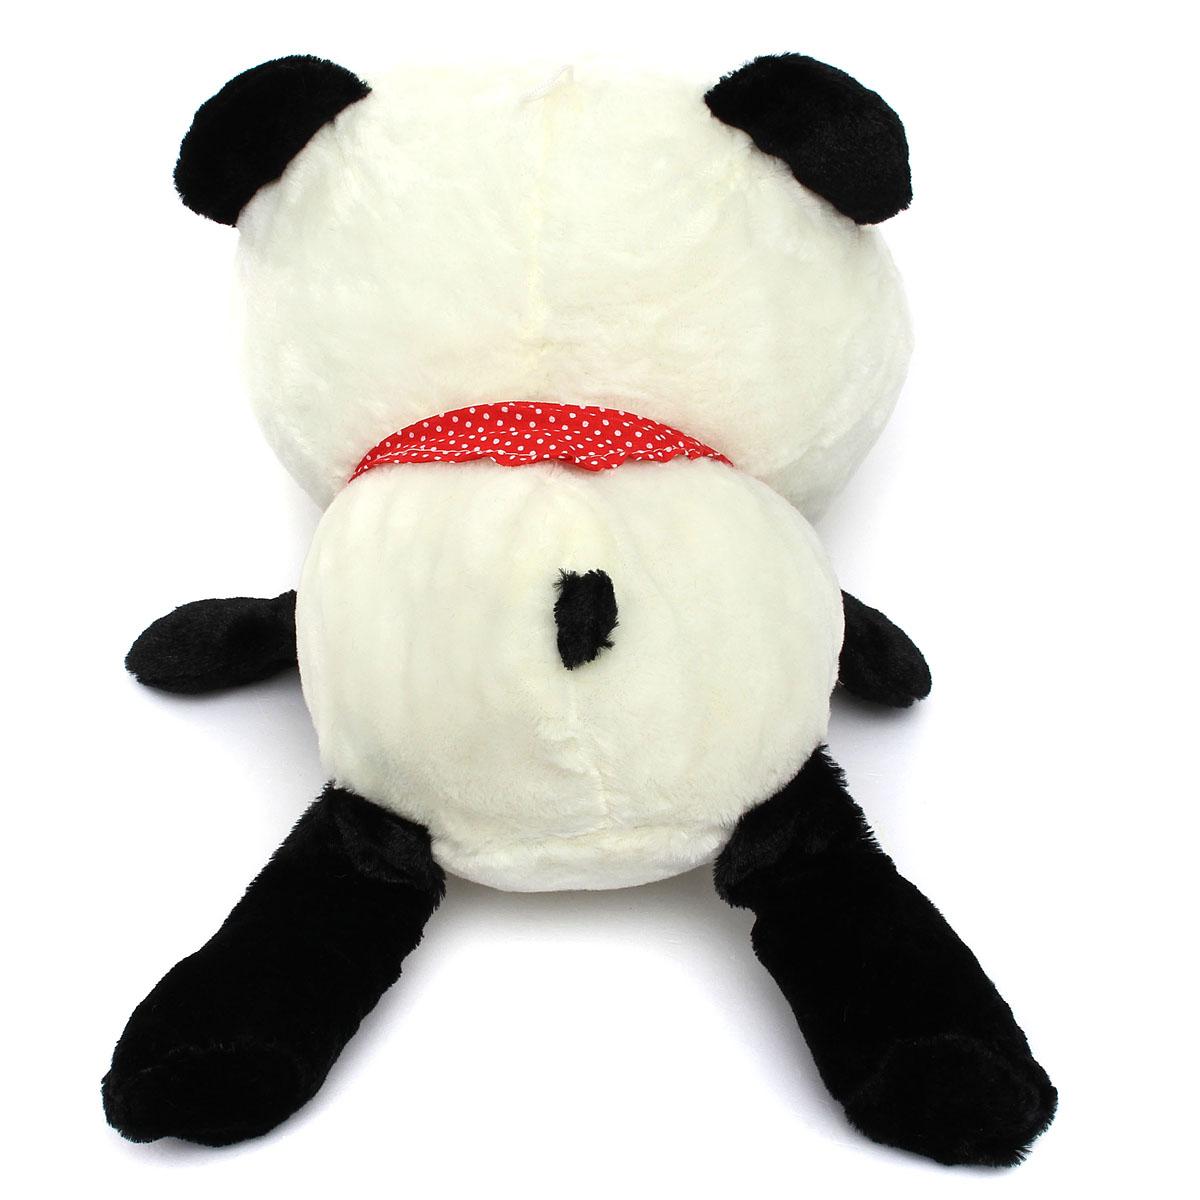 Cute Pillow Doll : 45CM 17 Stuffed Plush Doll Toy Animal Cute Panda Pillow Gift Alex NLD